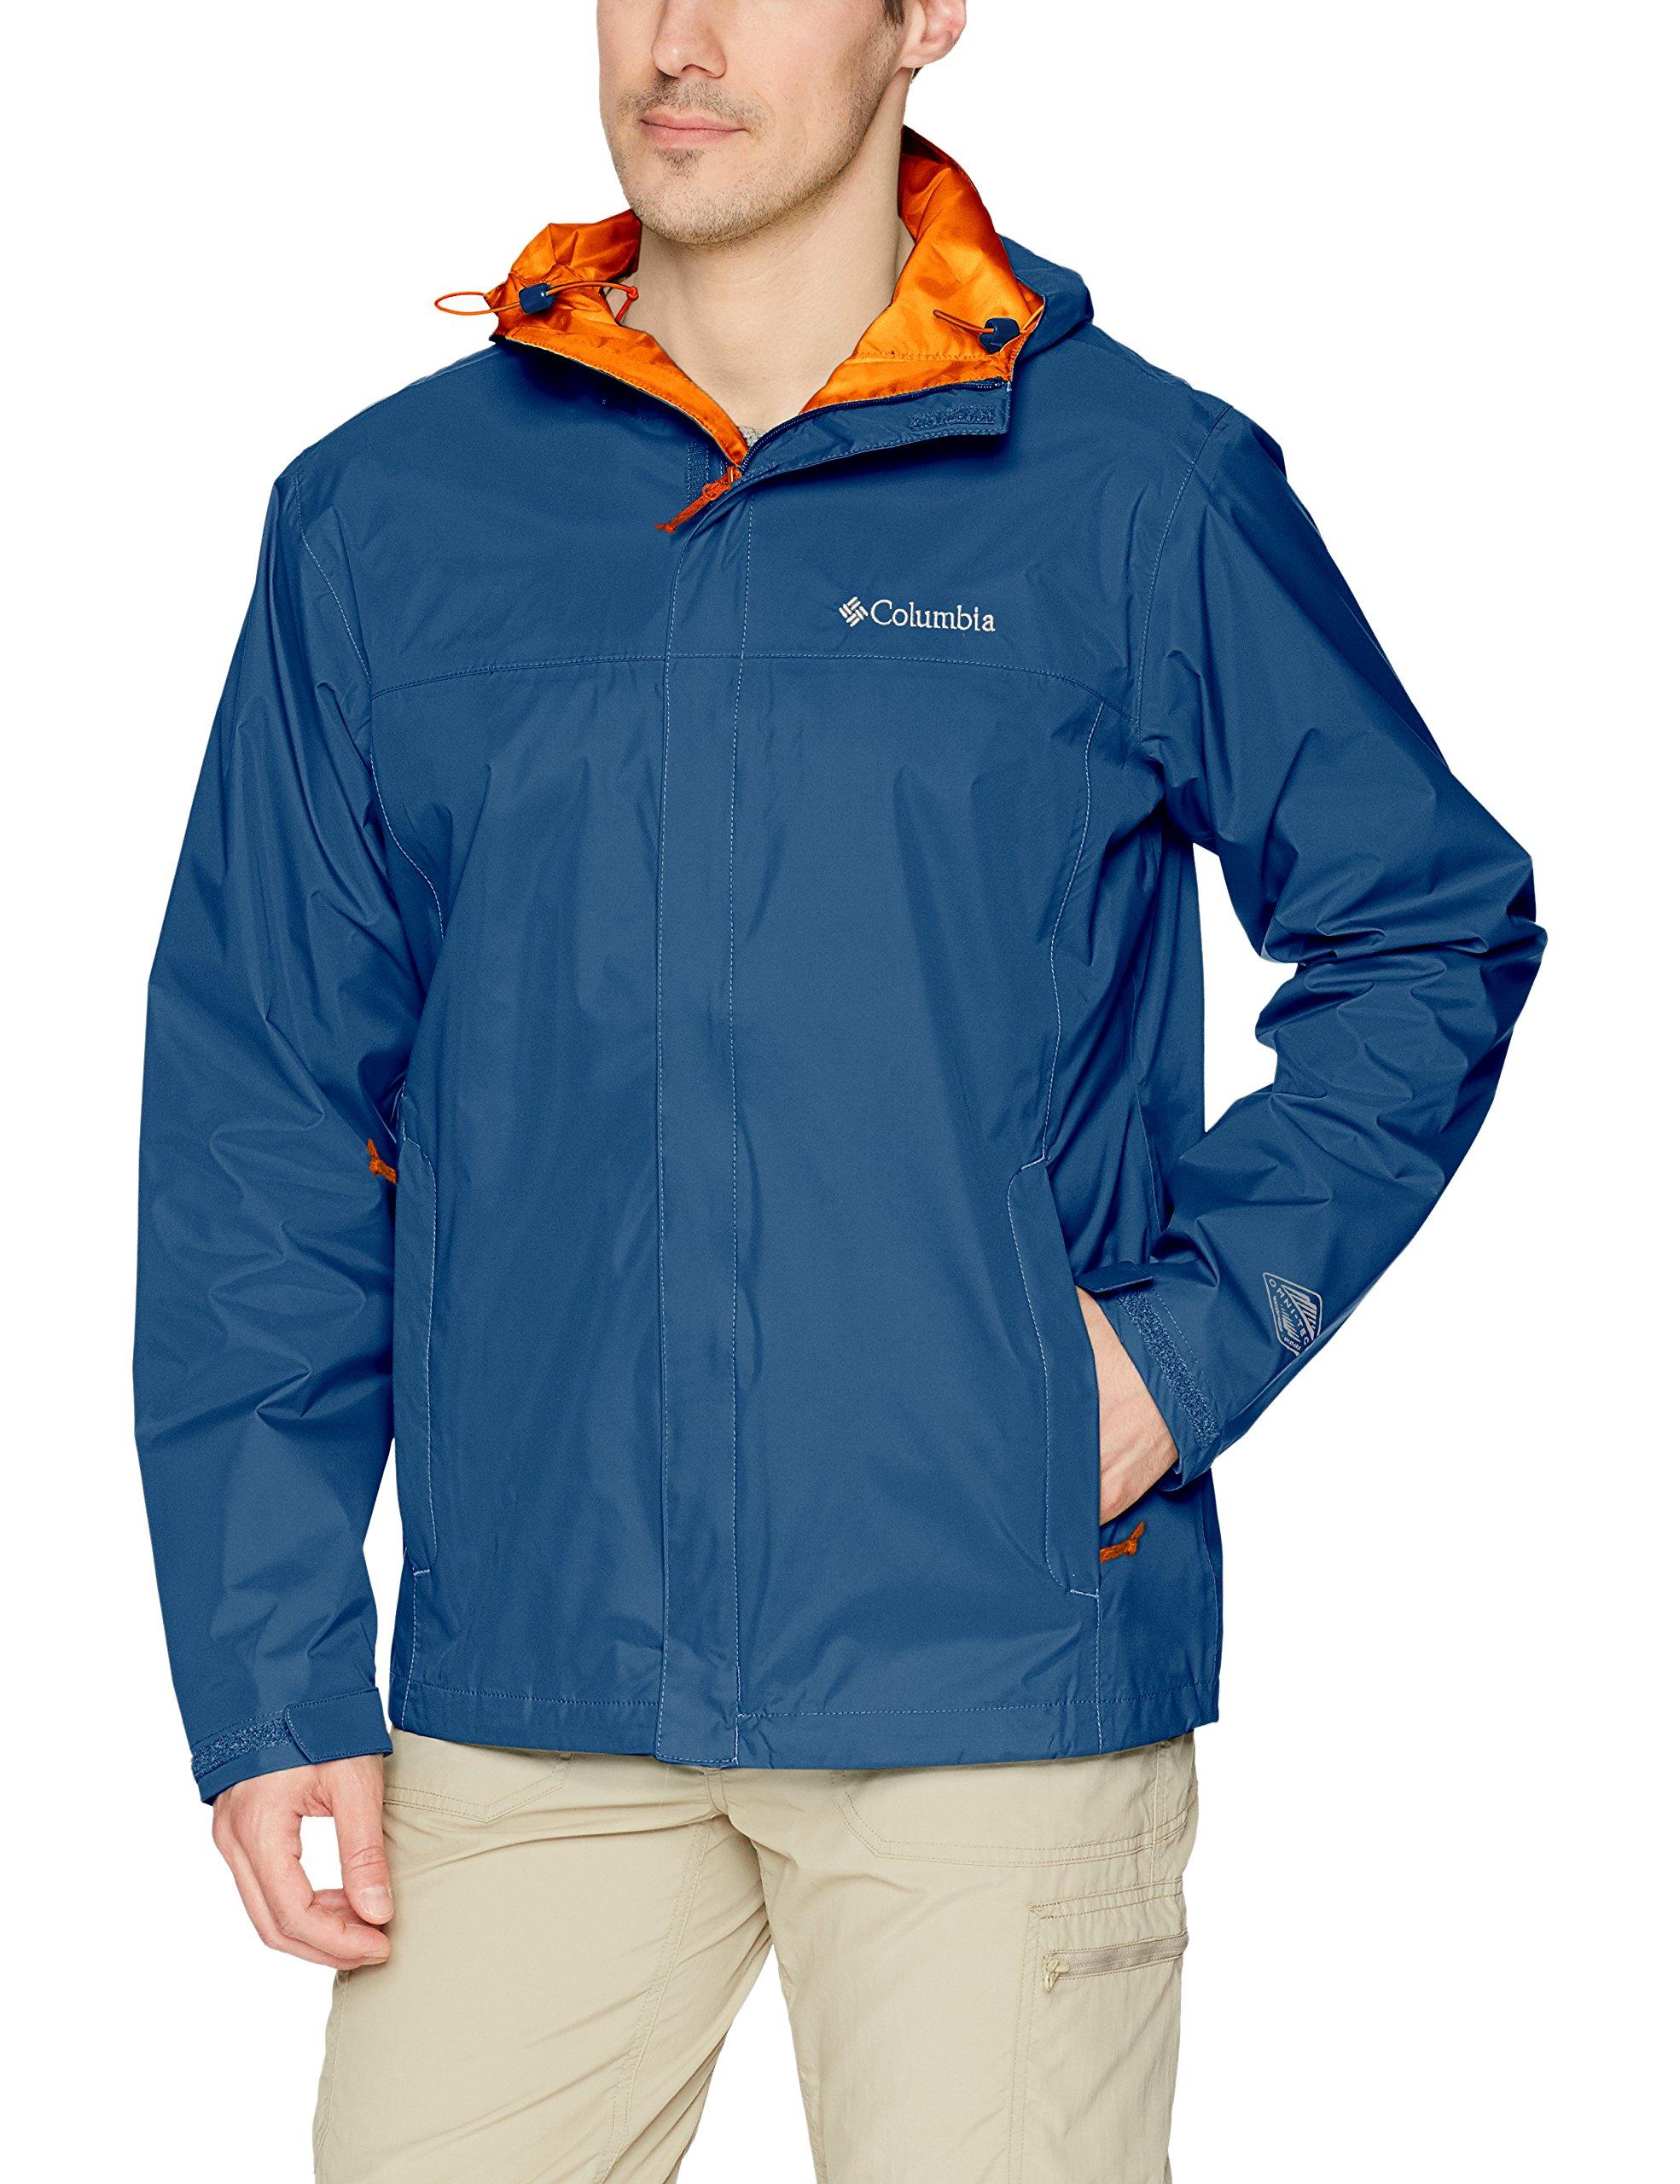 Columbia Men's Watertight II Jacket, Carbon, L